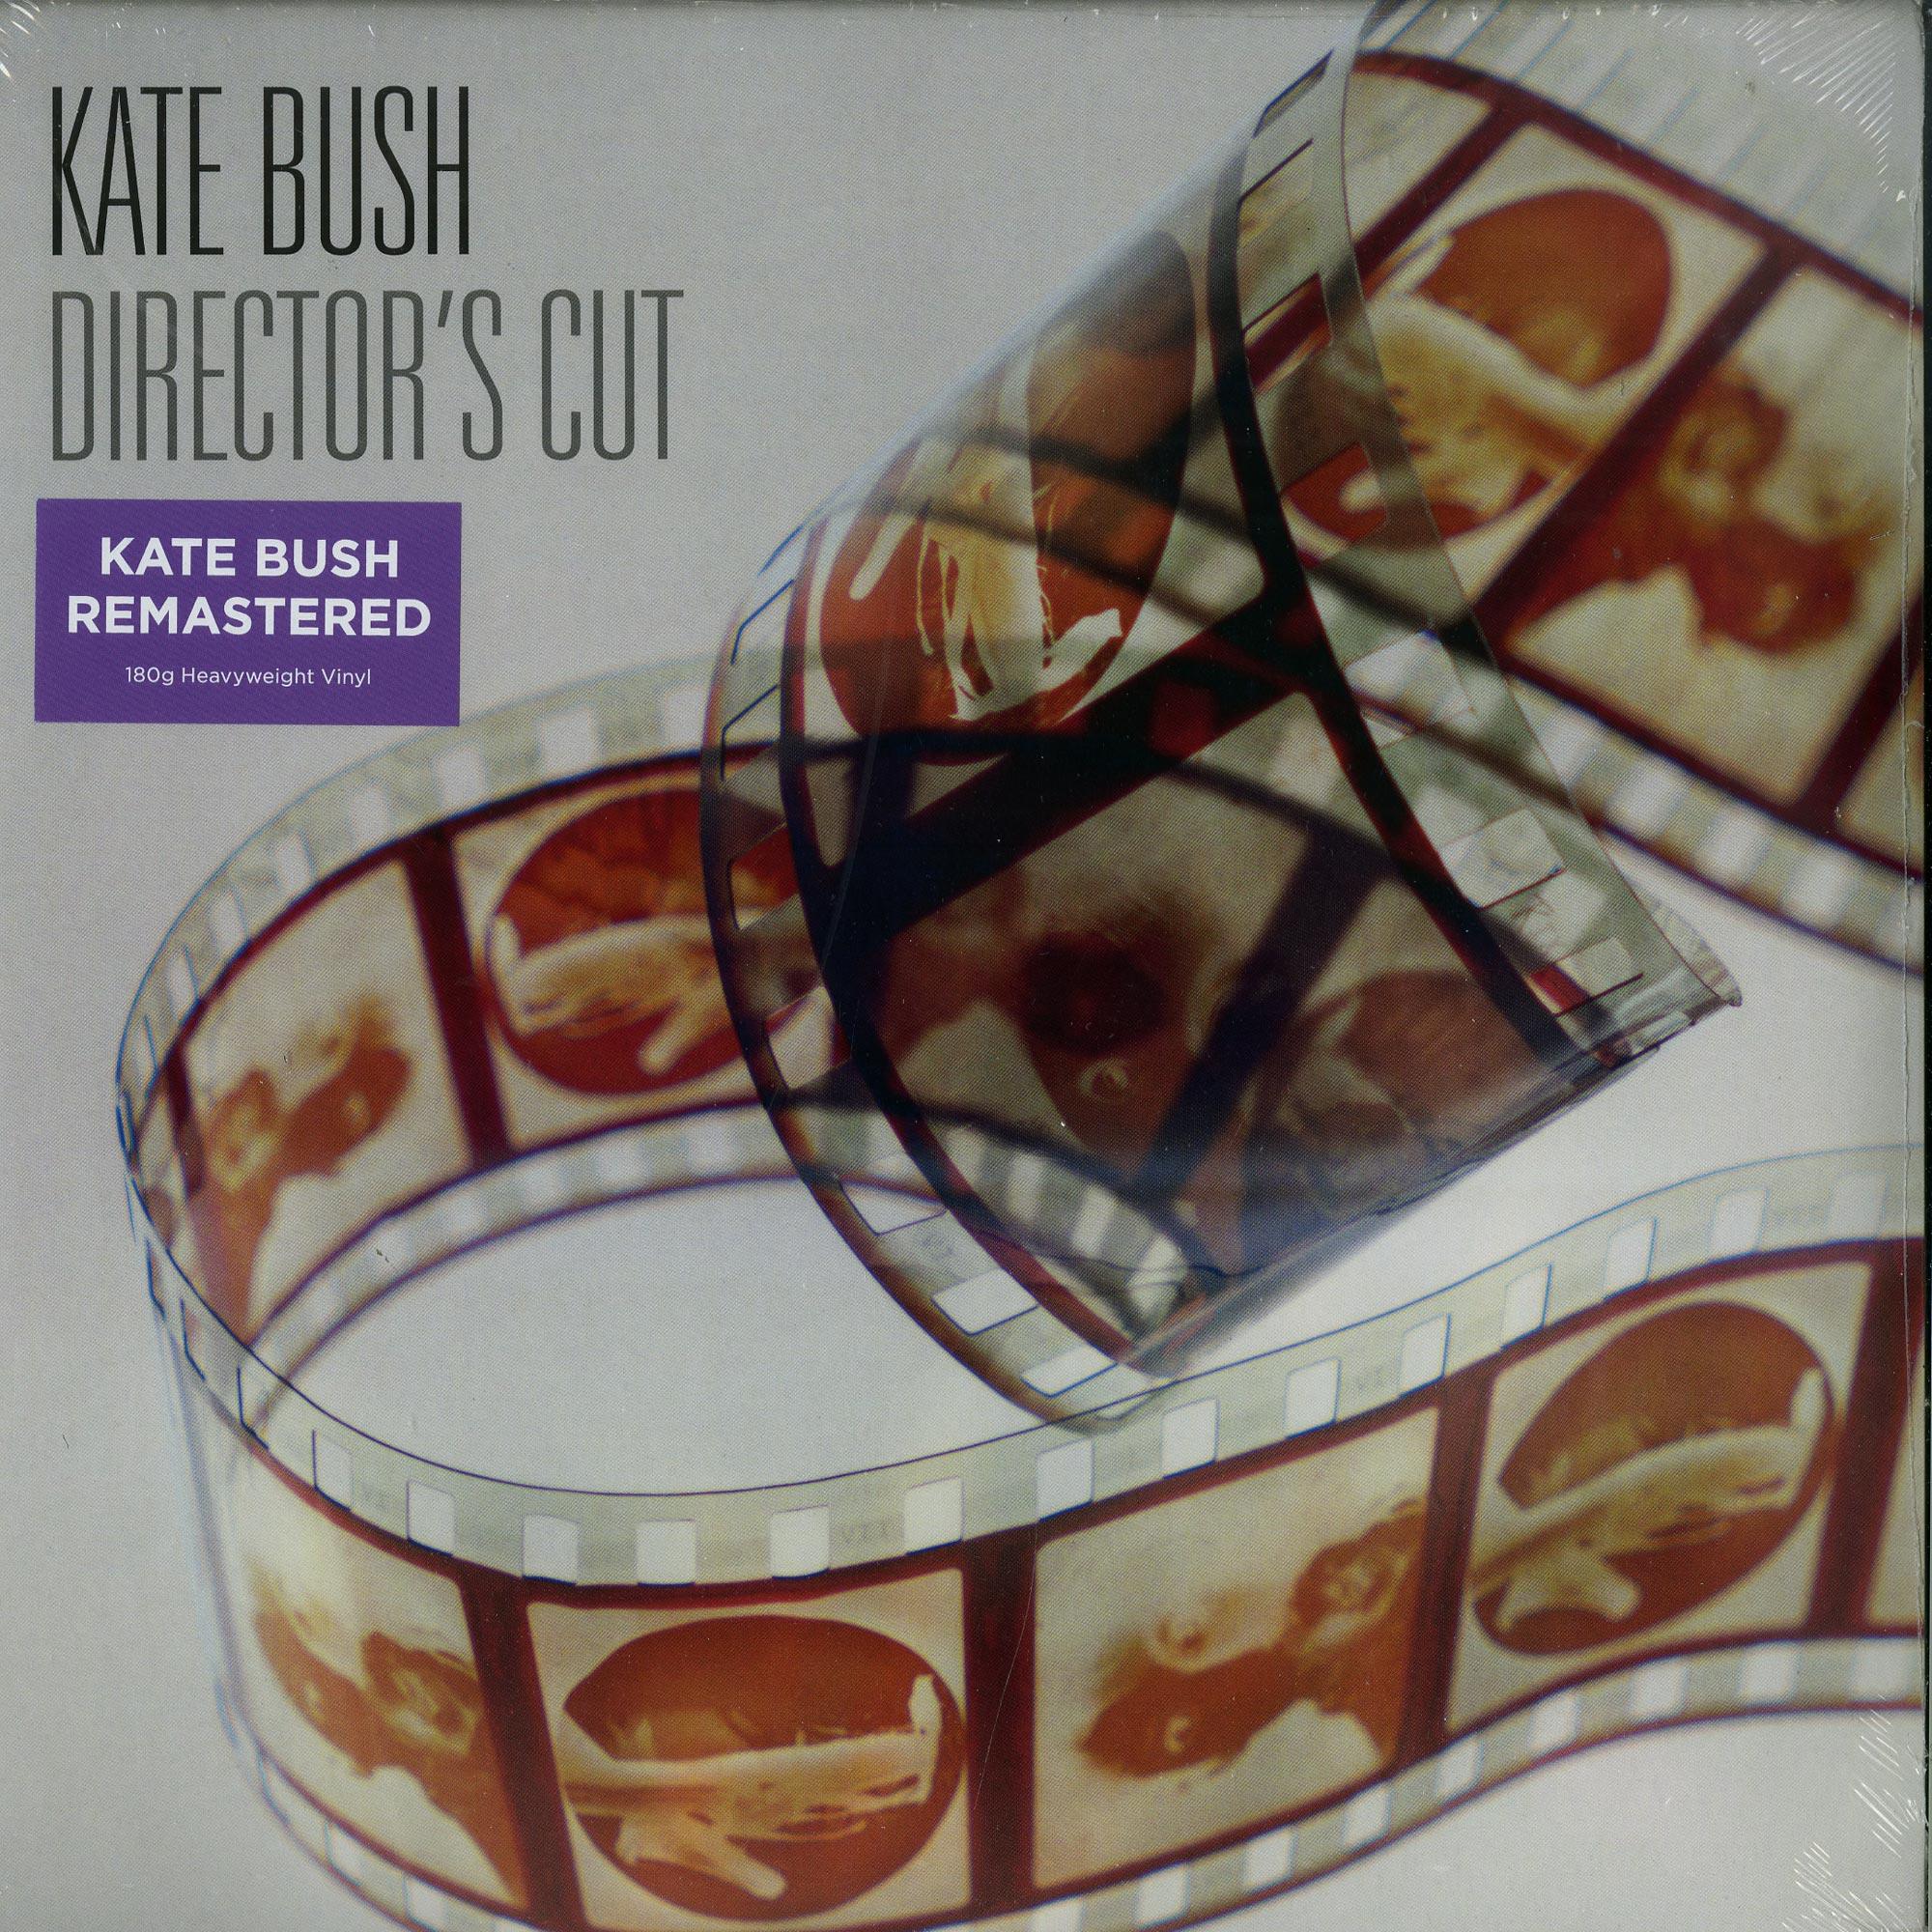 Kate Bush - DIRECTORS CUT